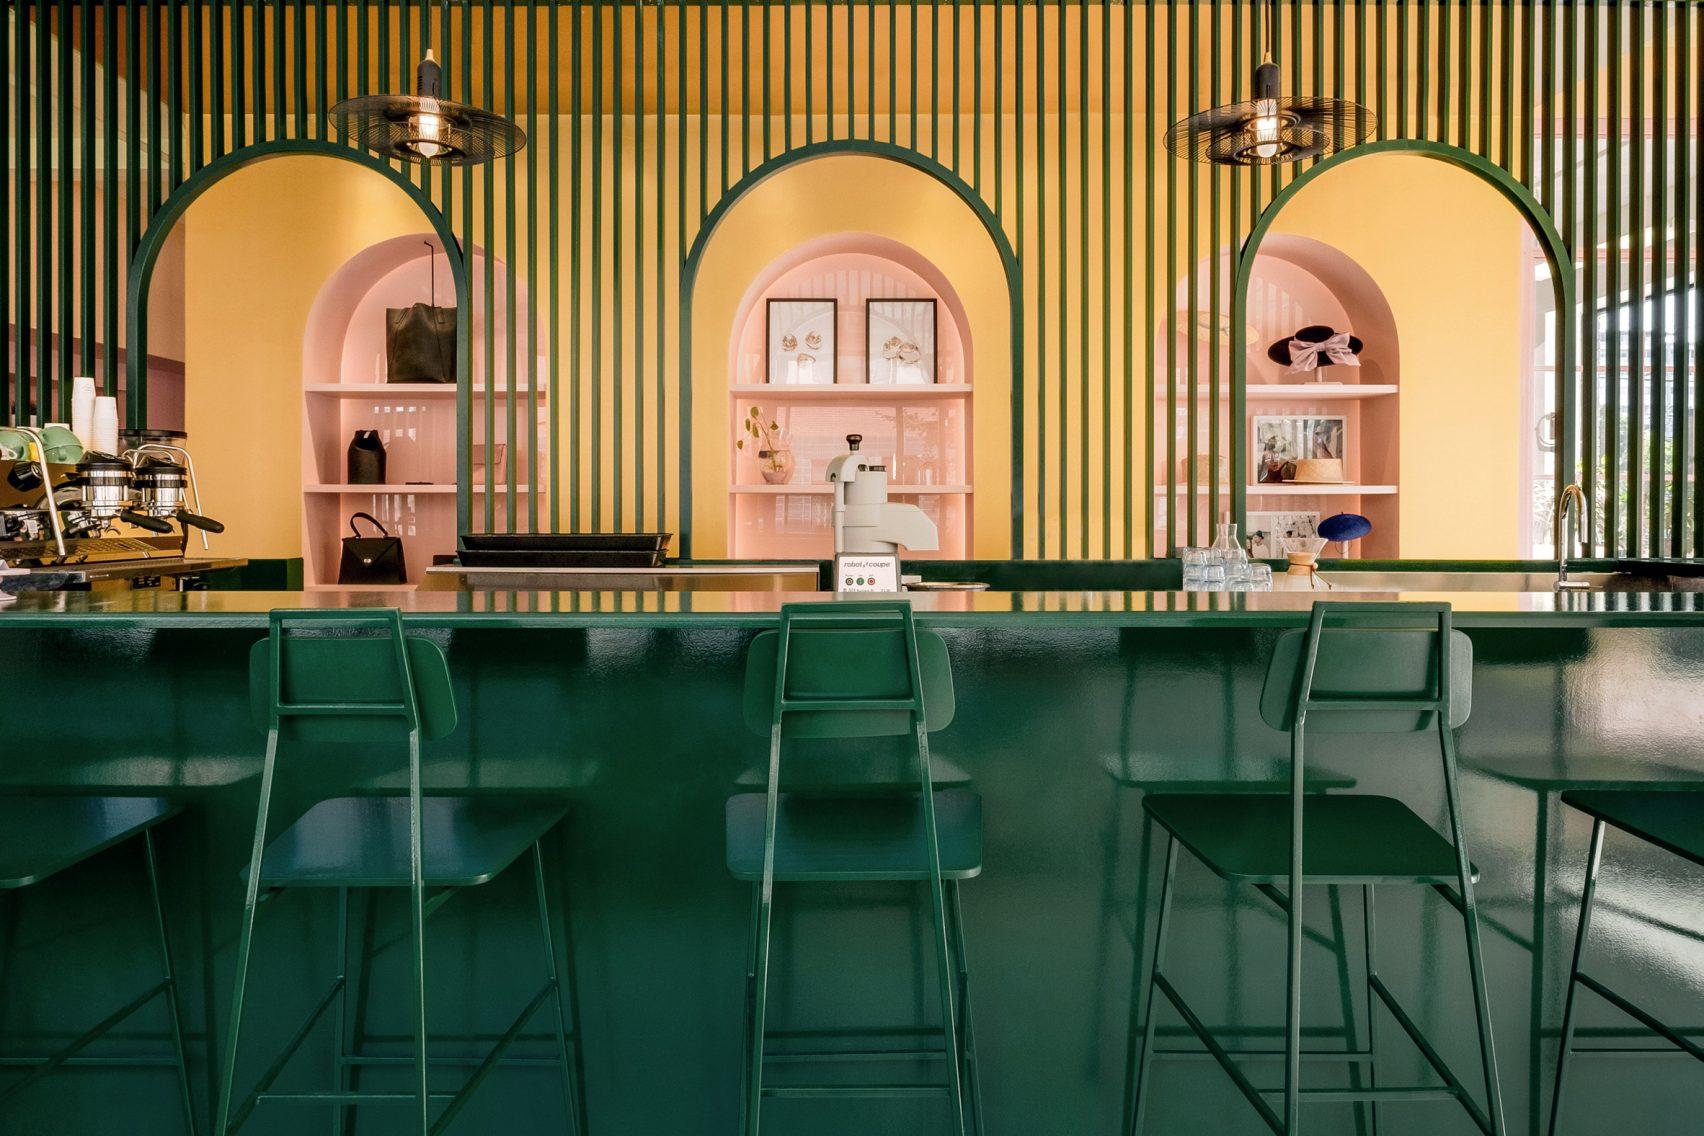 Цветомаркировка залов кафе Pastel Rita